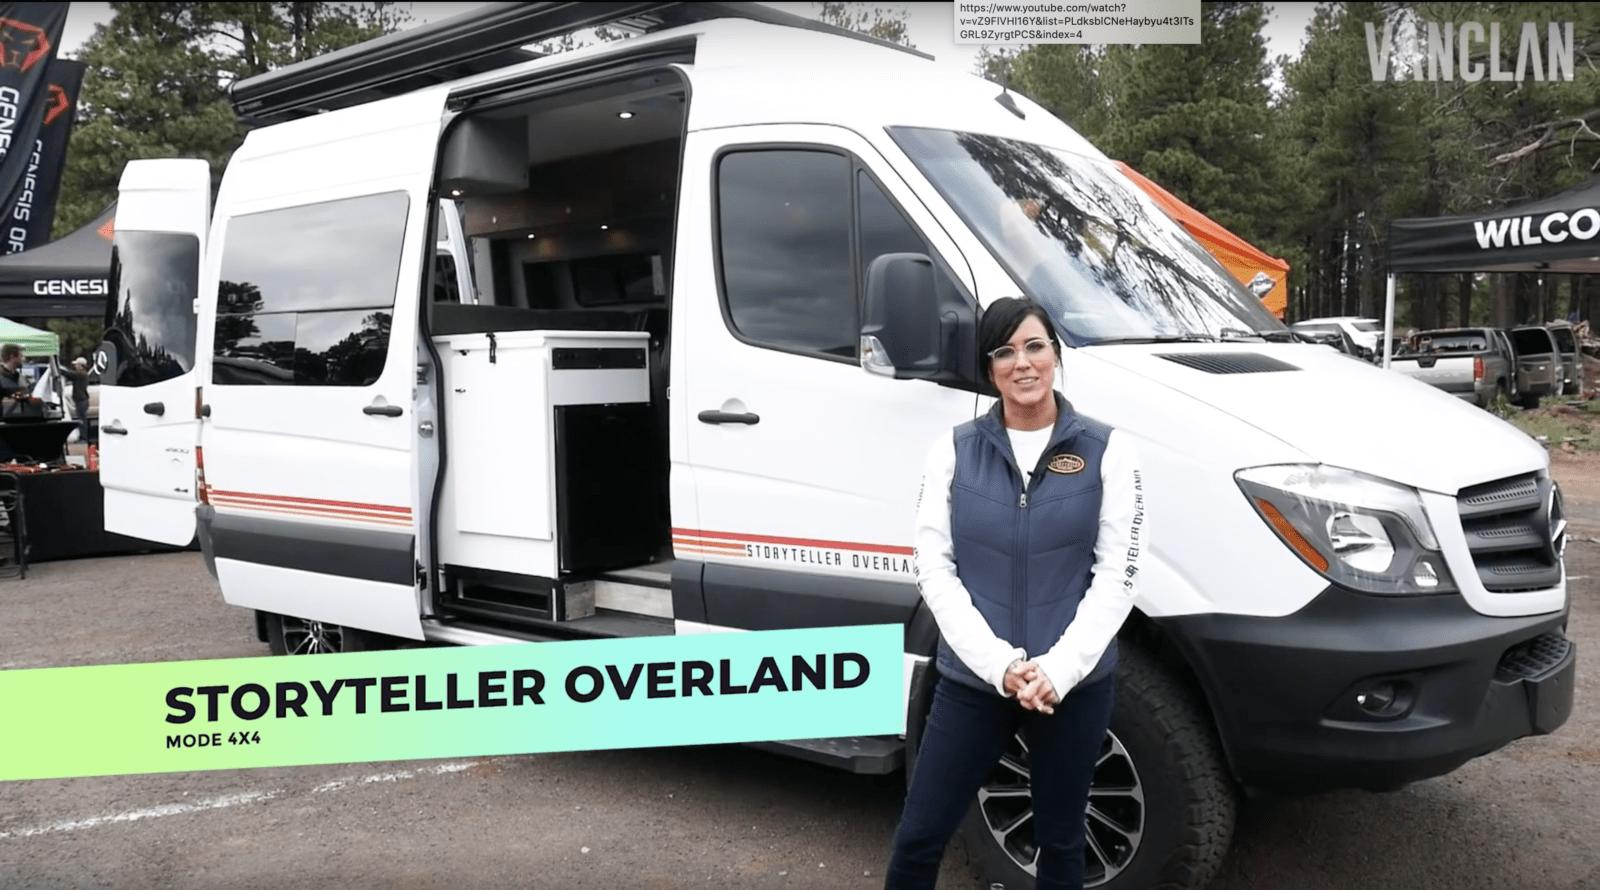 Storyteller Overland Van Clan Tour